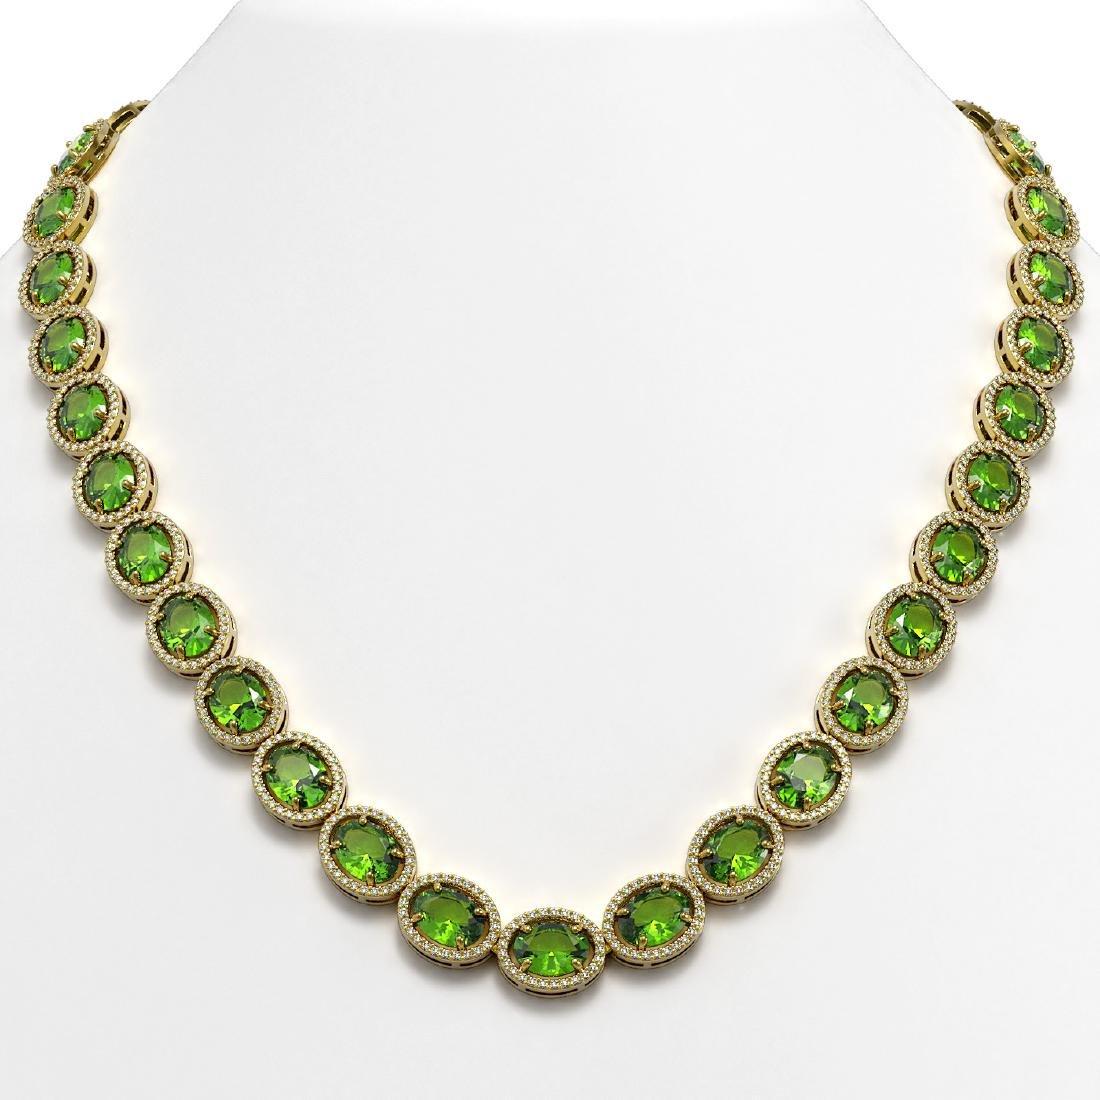 64.84 CTW Peridot & Diamond Halo Necklace 10K Yellow